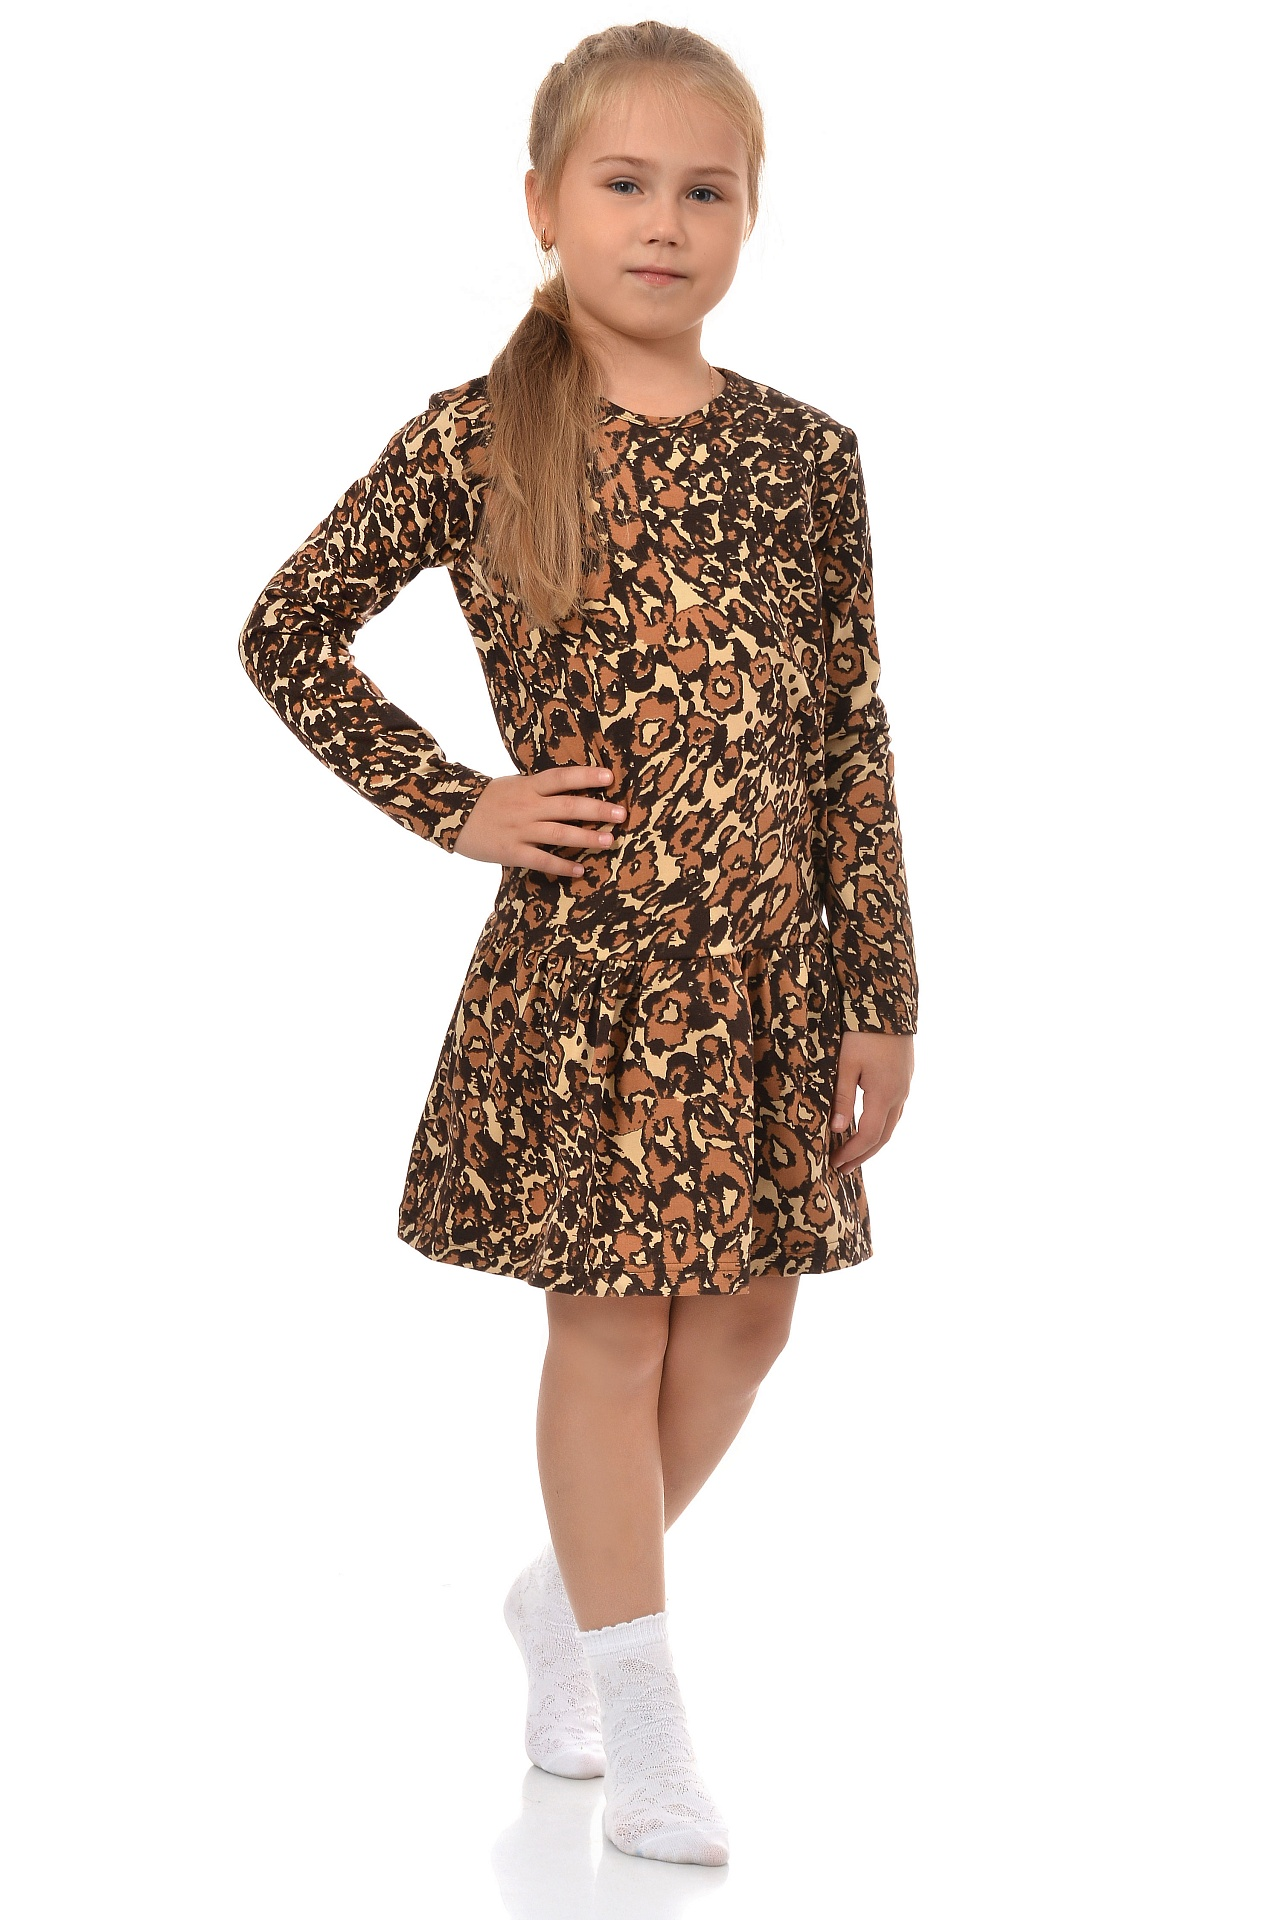 Платье детское Леопард kogankids kogankids платье леопард розовое